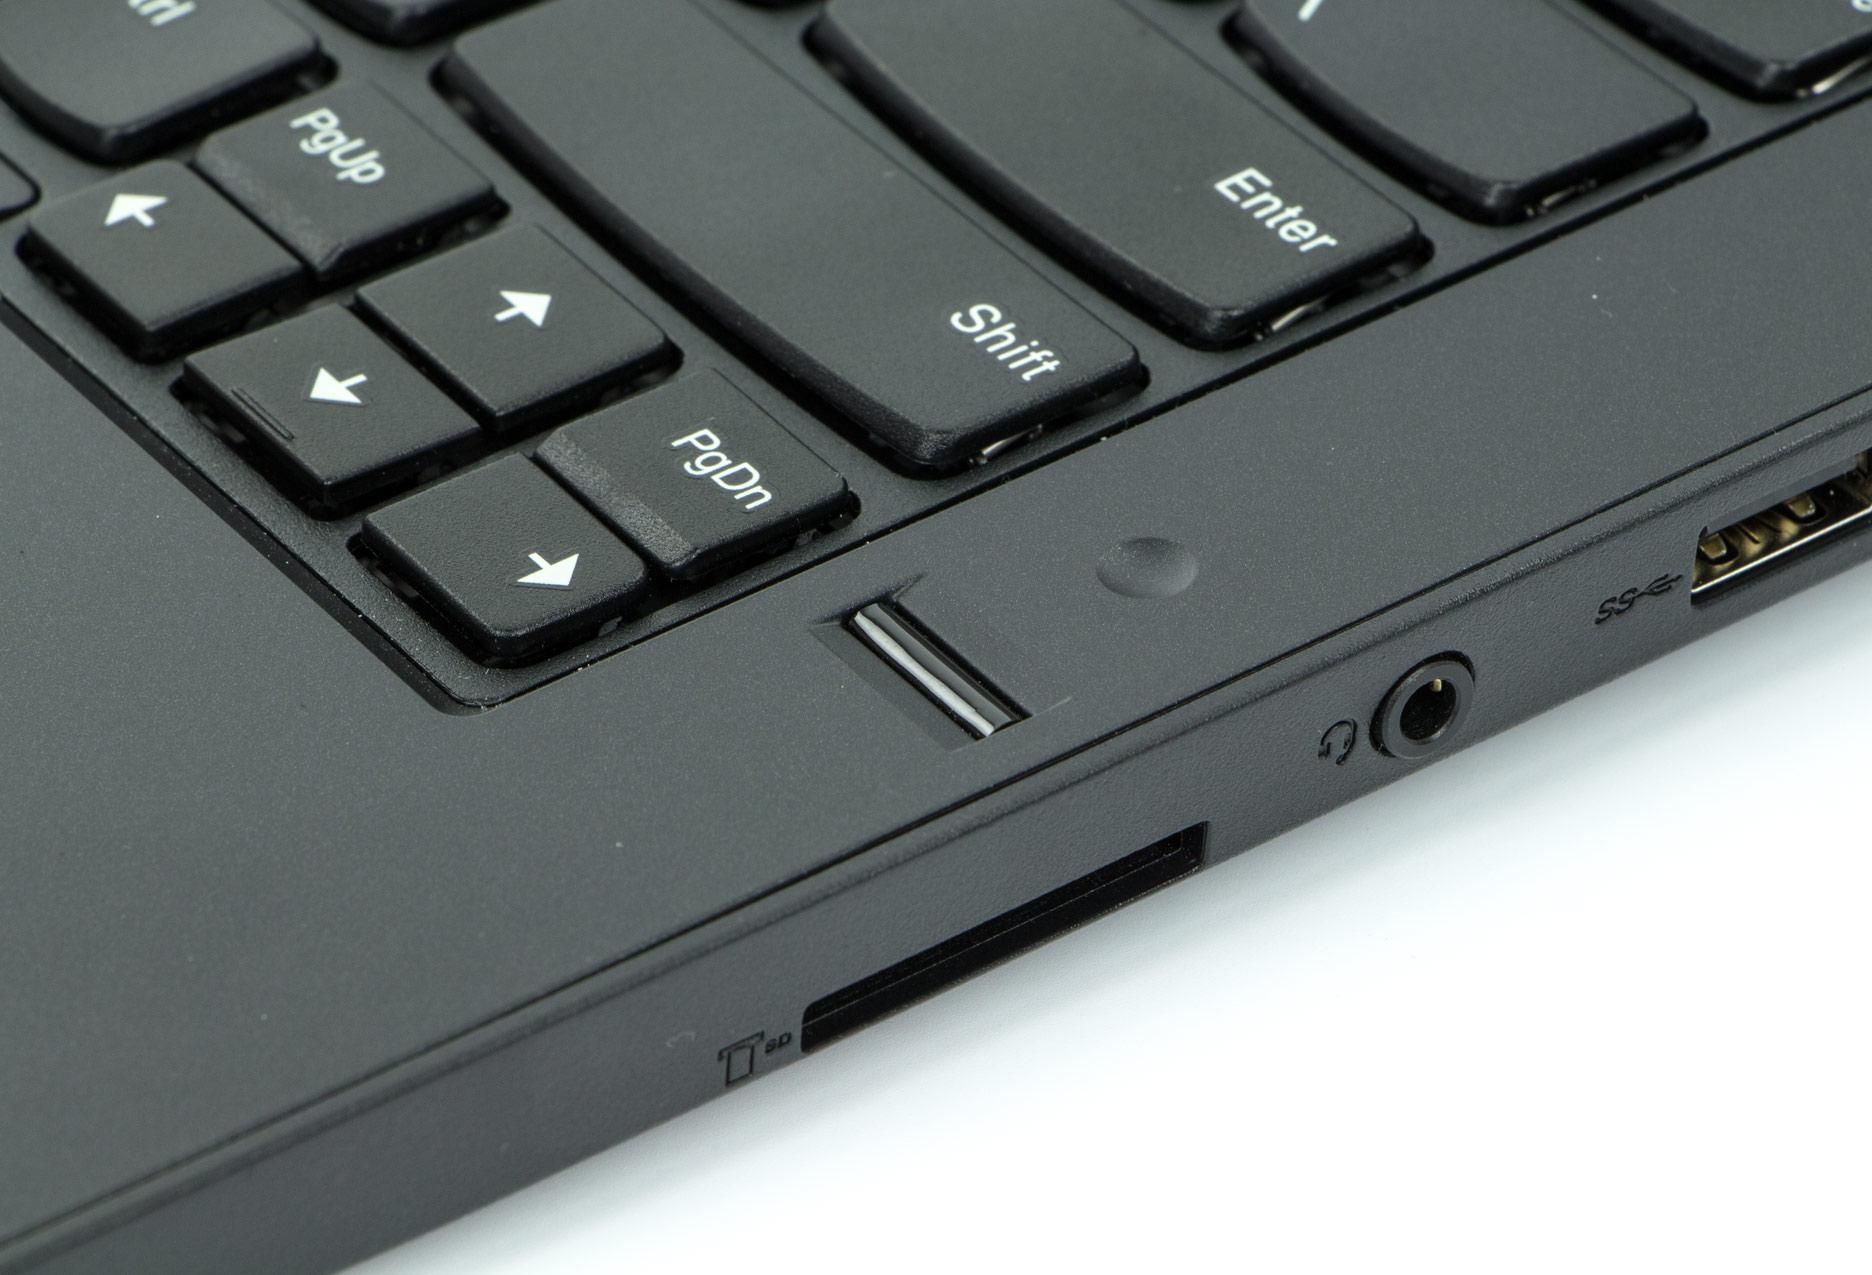 Lenovo ThinkPad E470 czytnik linii papilarnych